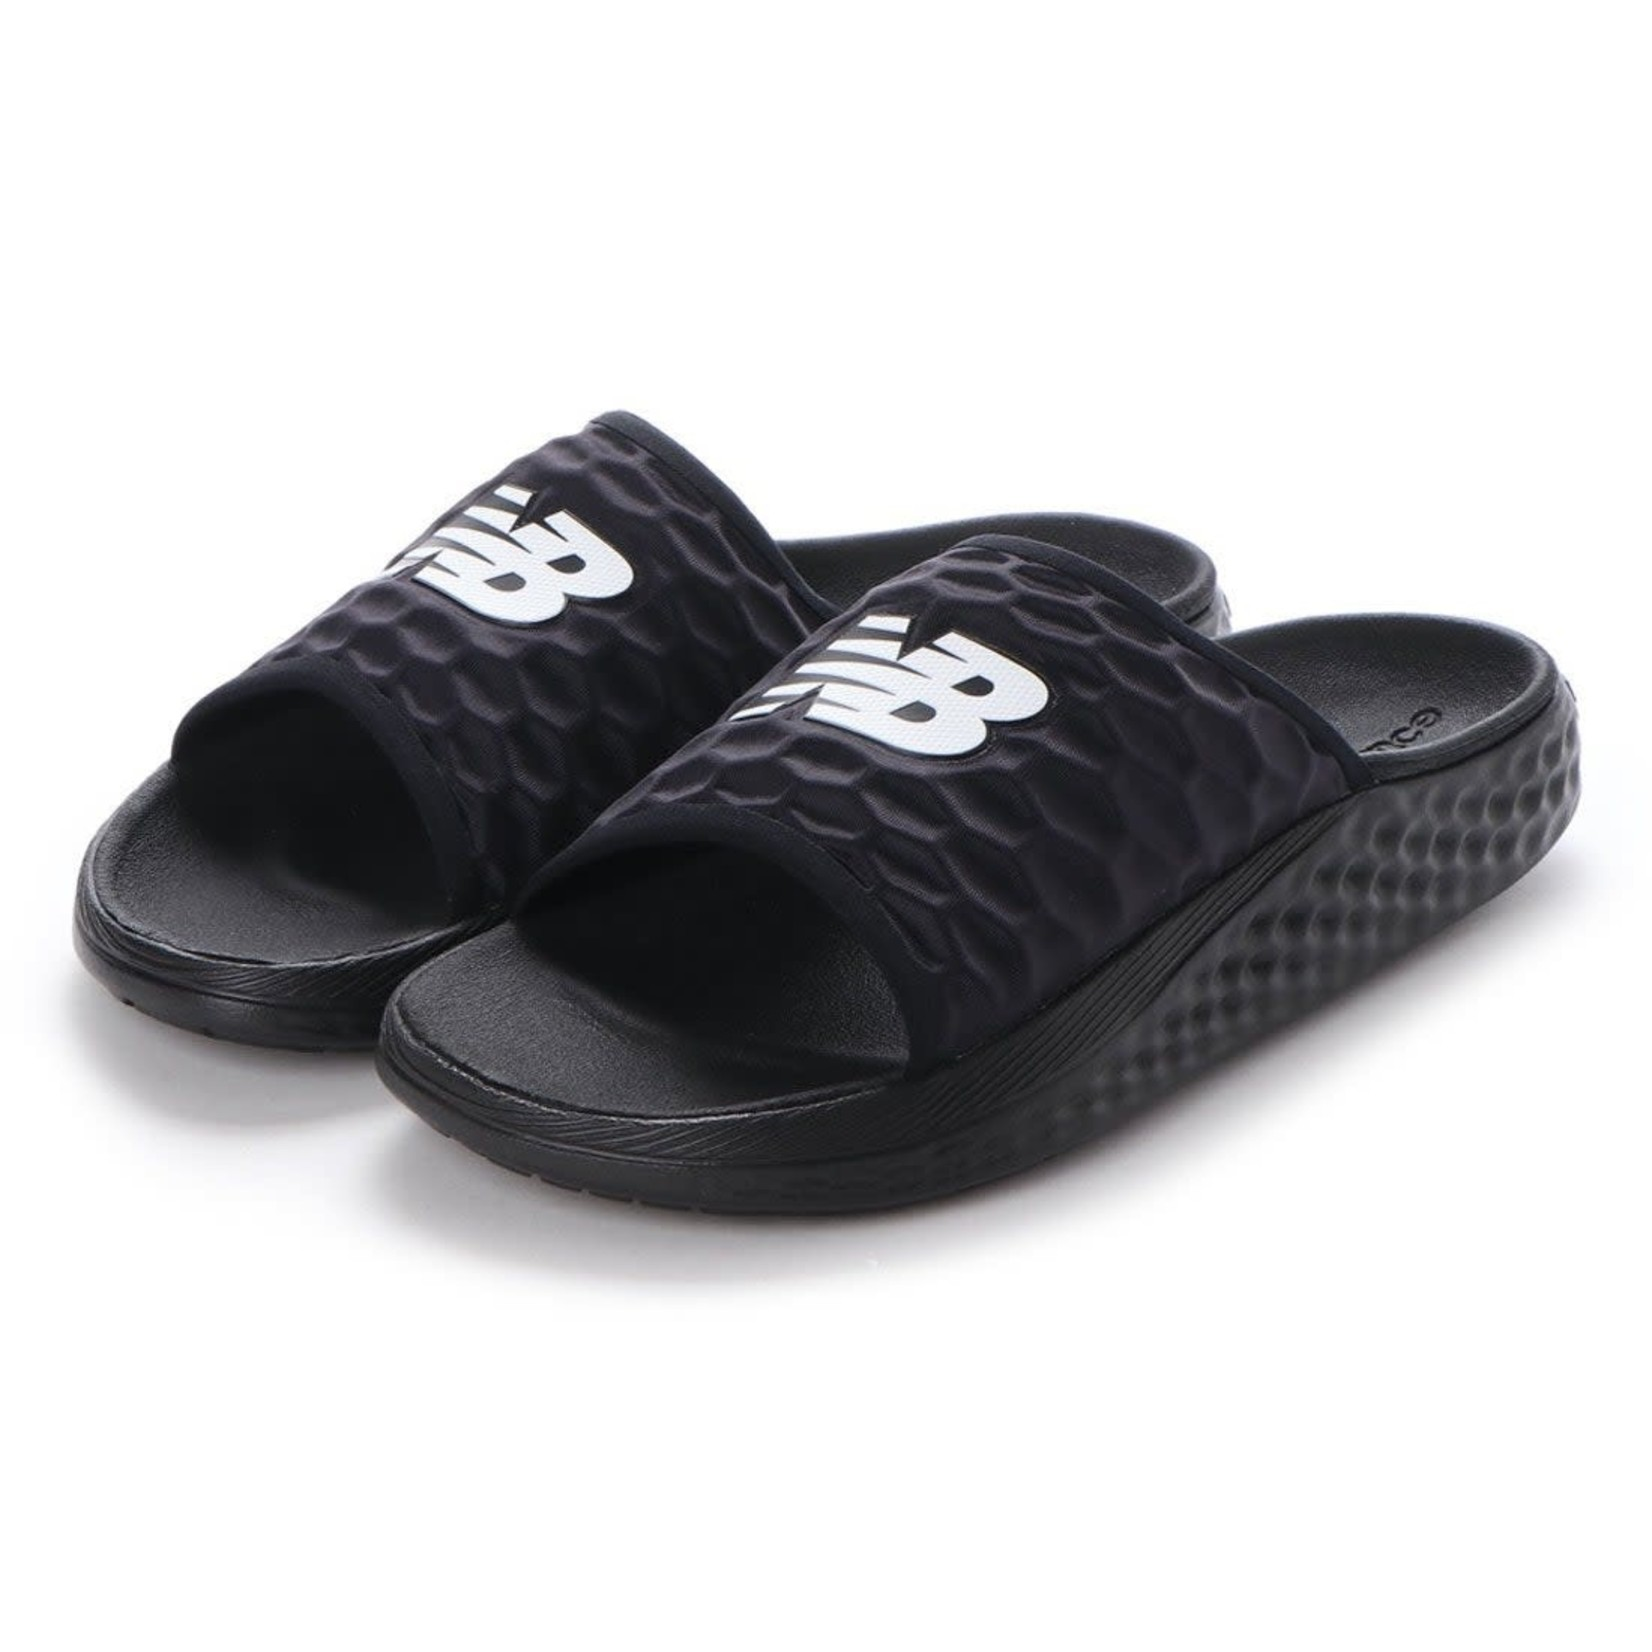 New Balance New Balance Sandals, SMFTEKK1, Mens